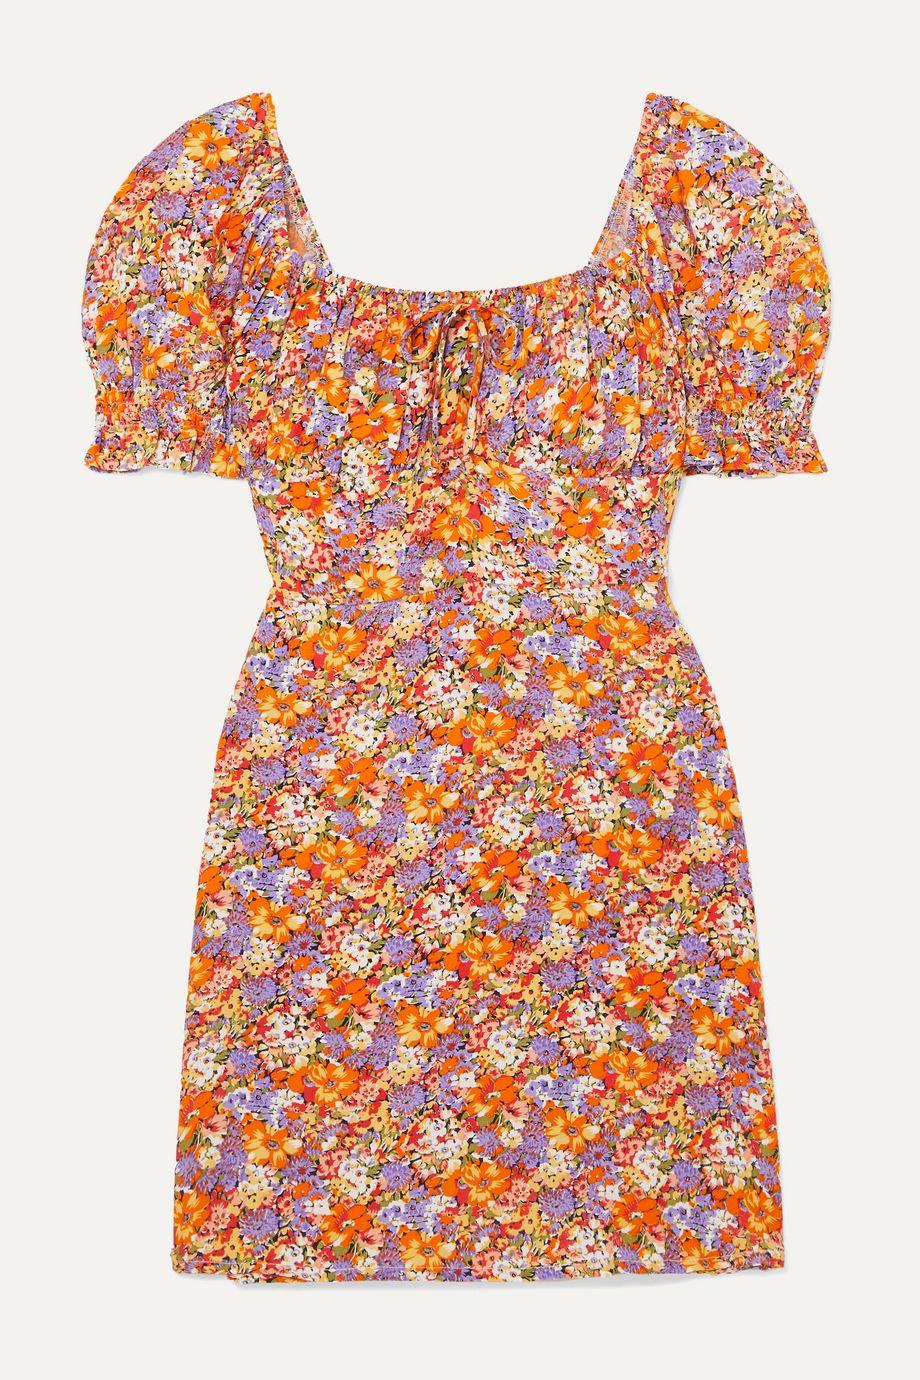 Faithfull The Brand Iris floral-print crepe mini dress